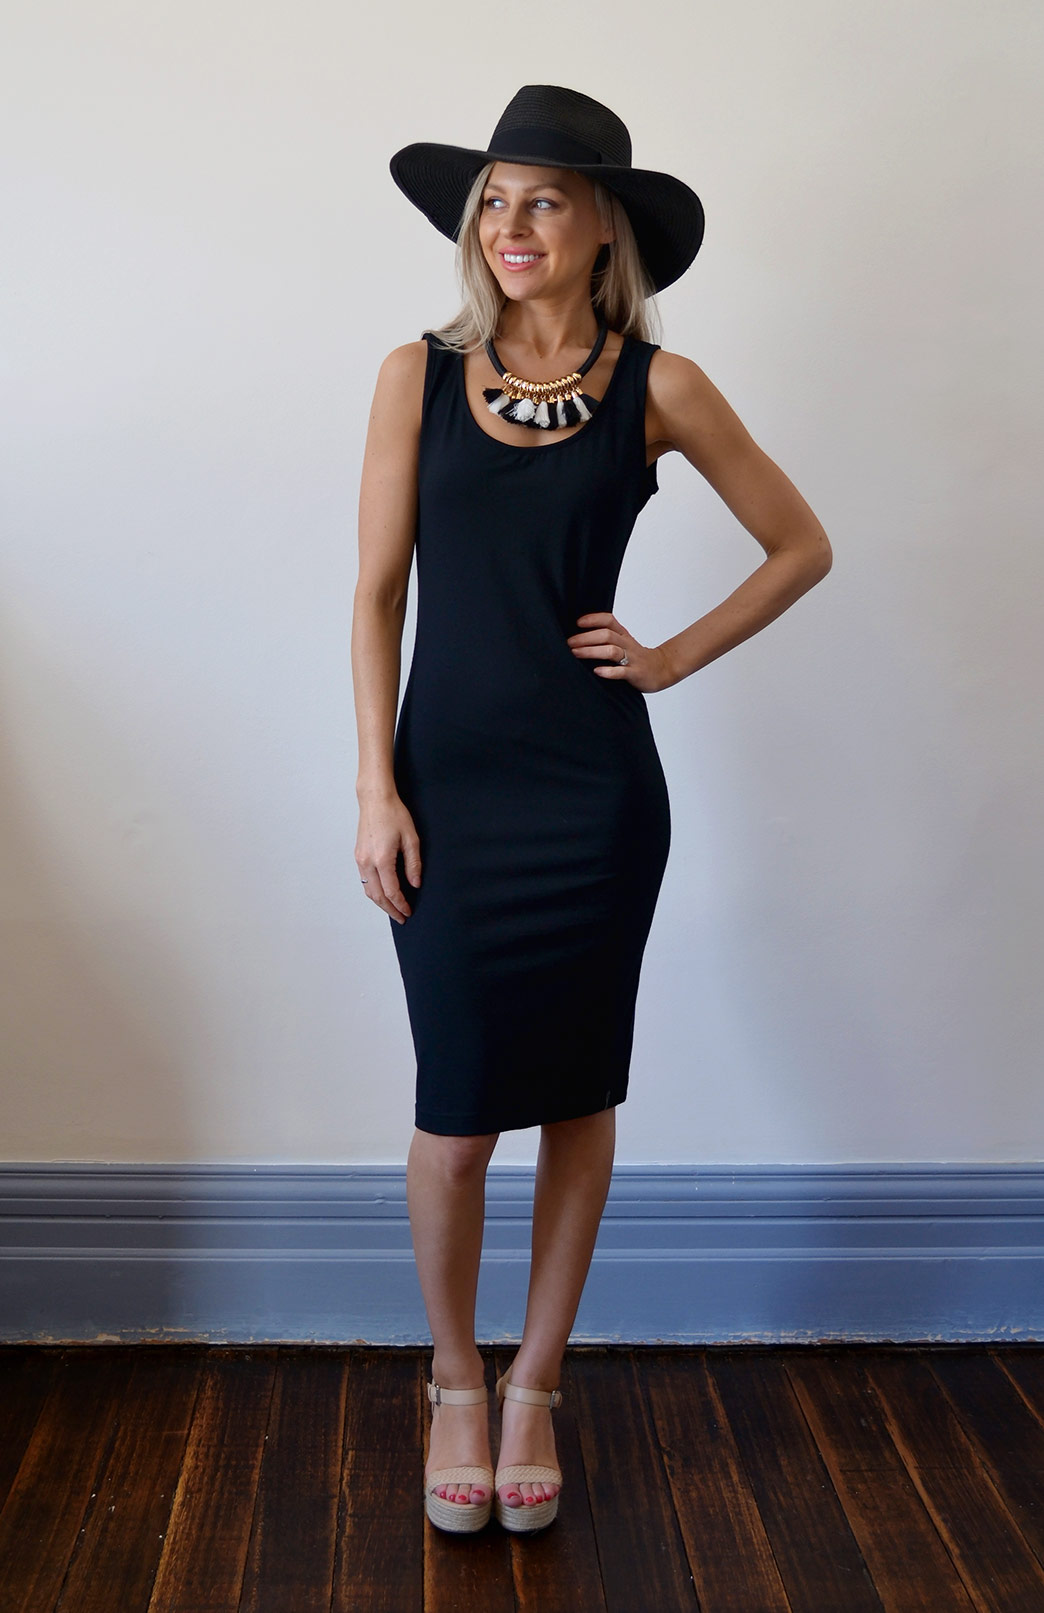 Scoop Dress - Sleeveless - Women's Black Sleeveless Fitted Scoop Dress - Smitten Merino Tasmania Australia